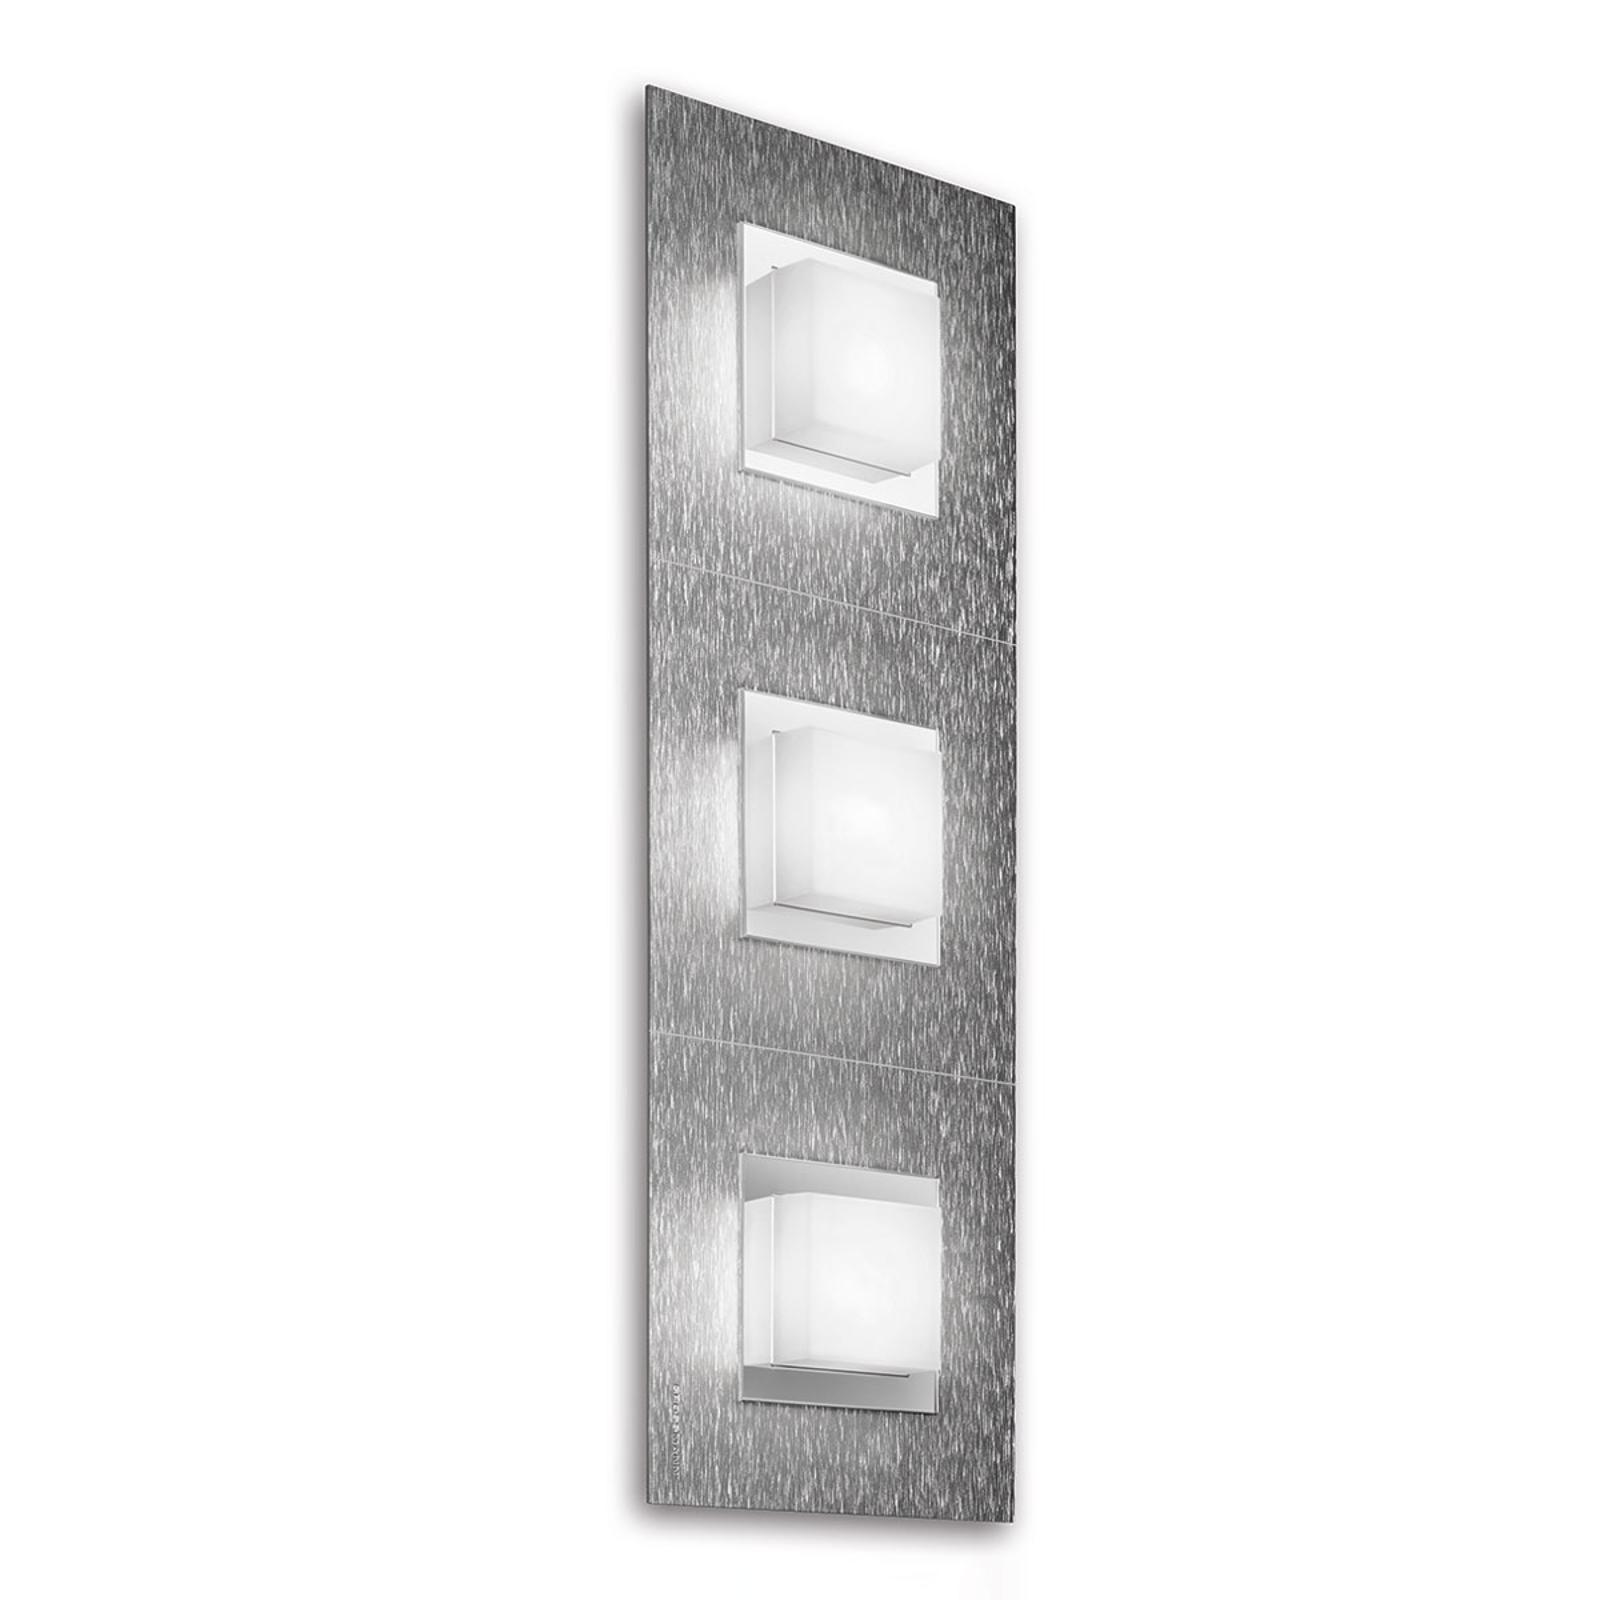 GROSSMANN Basic LED-Wandleuchte 3flg., aluminium